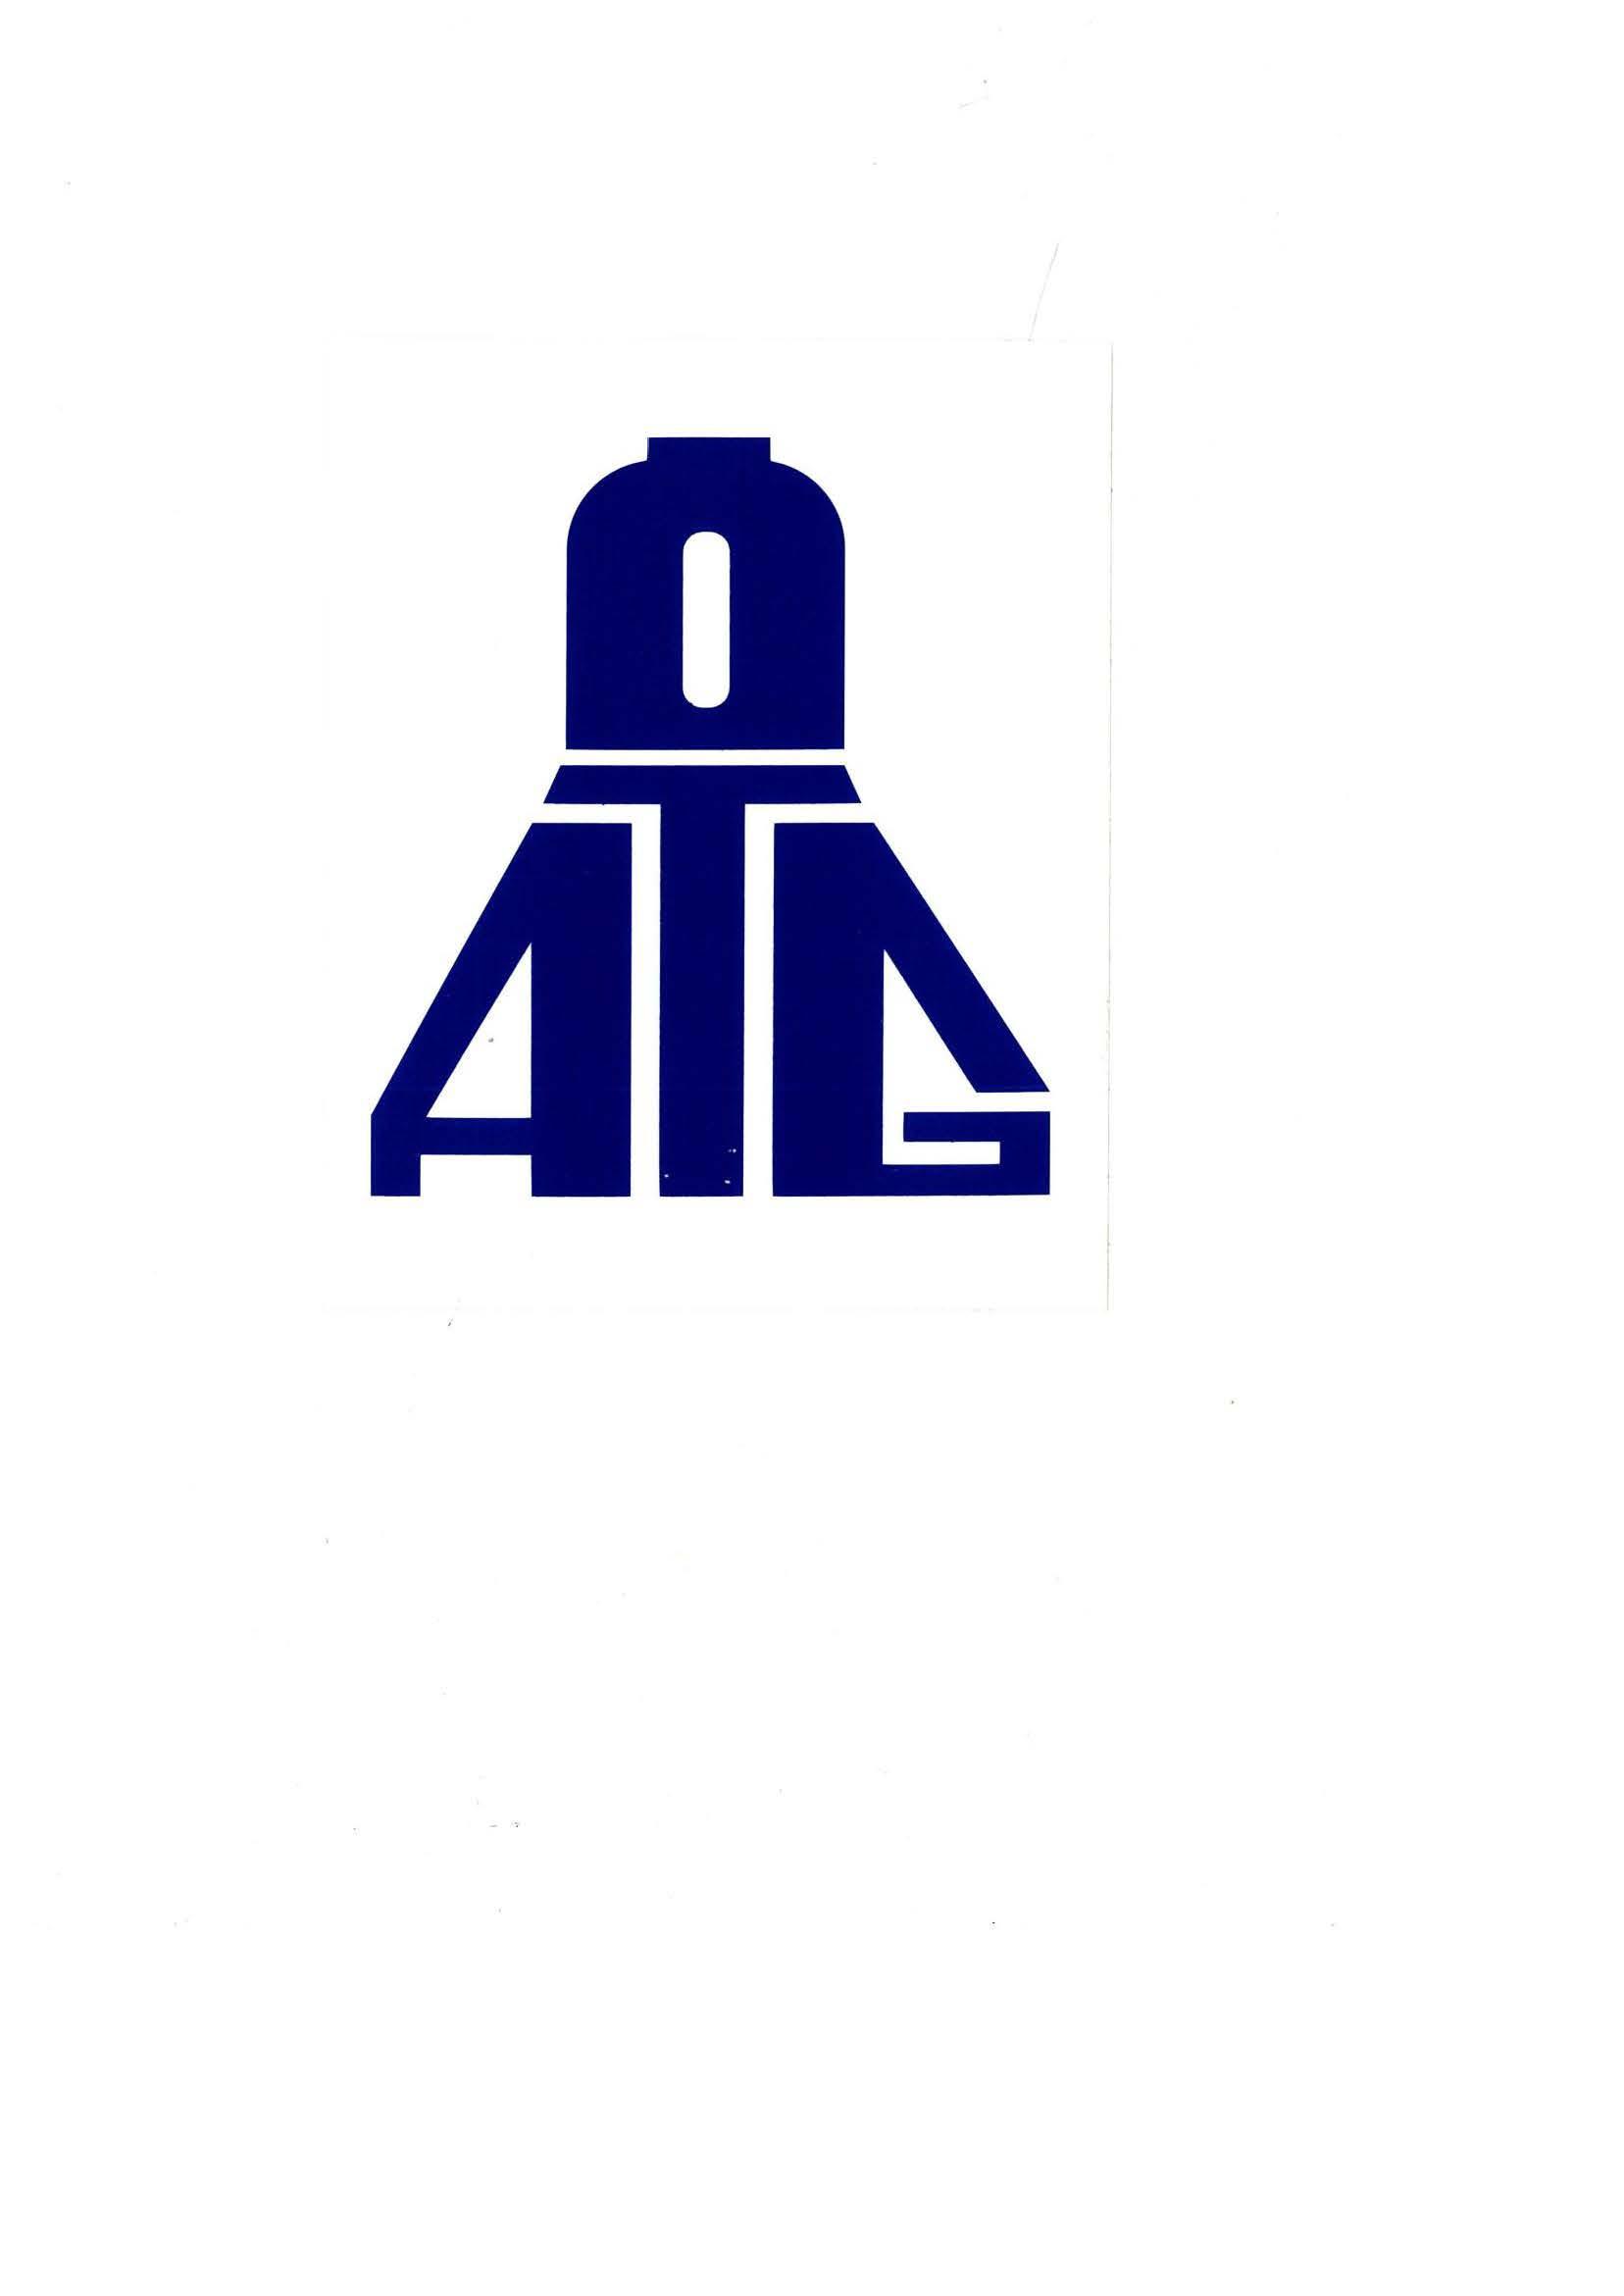 ASIA TECHNICAL GAS CO PTE LTD